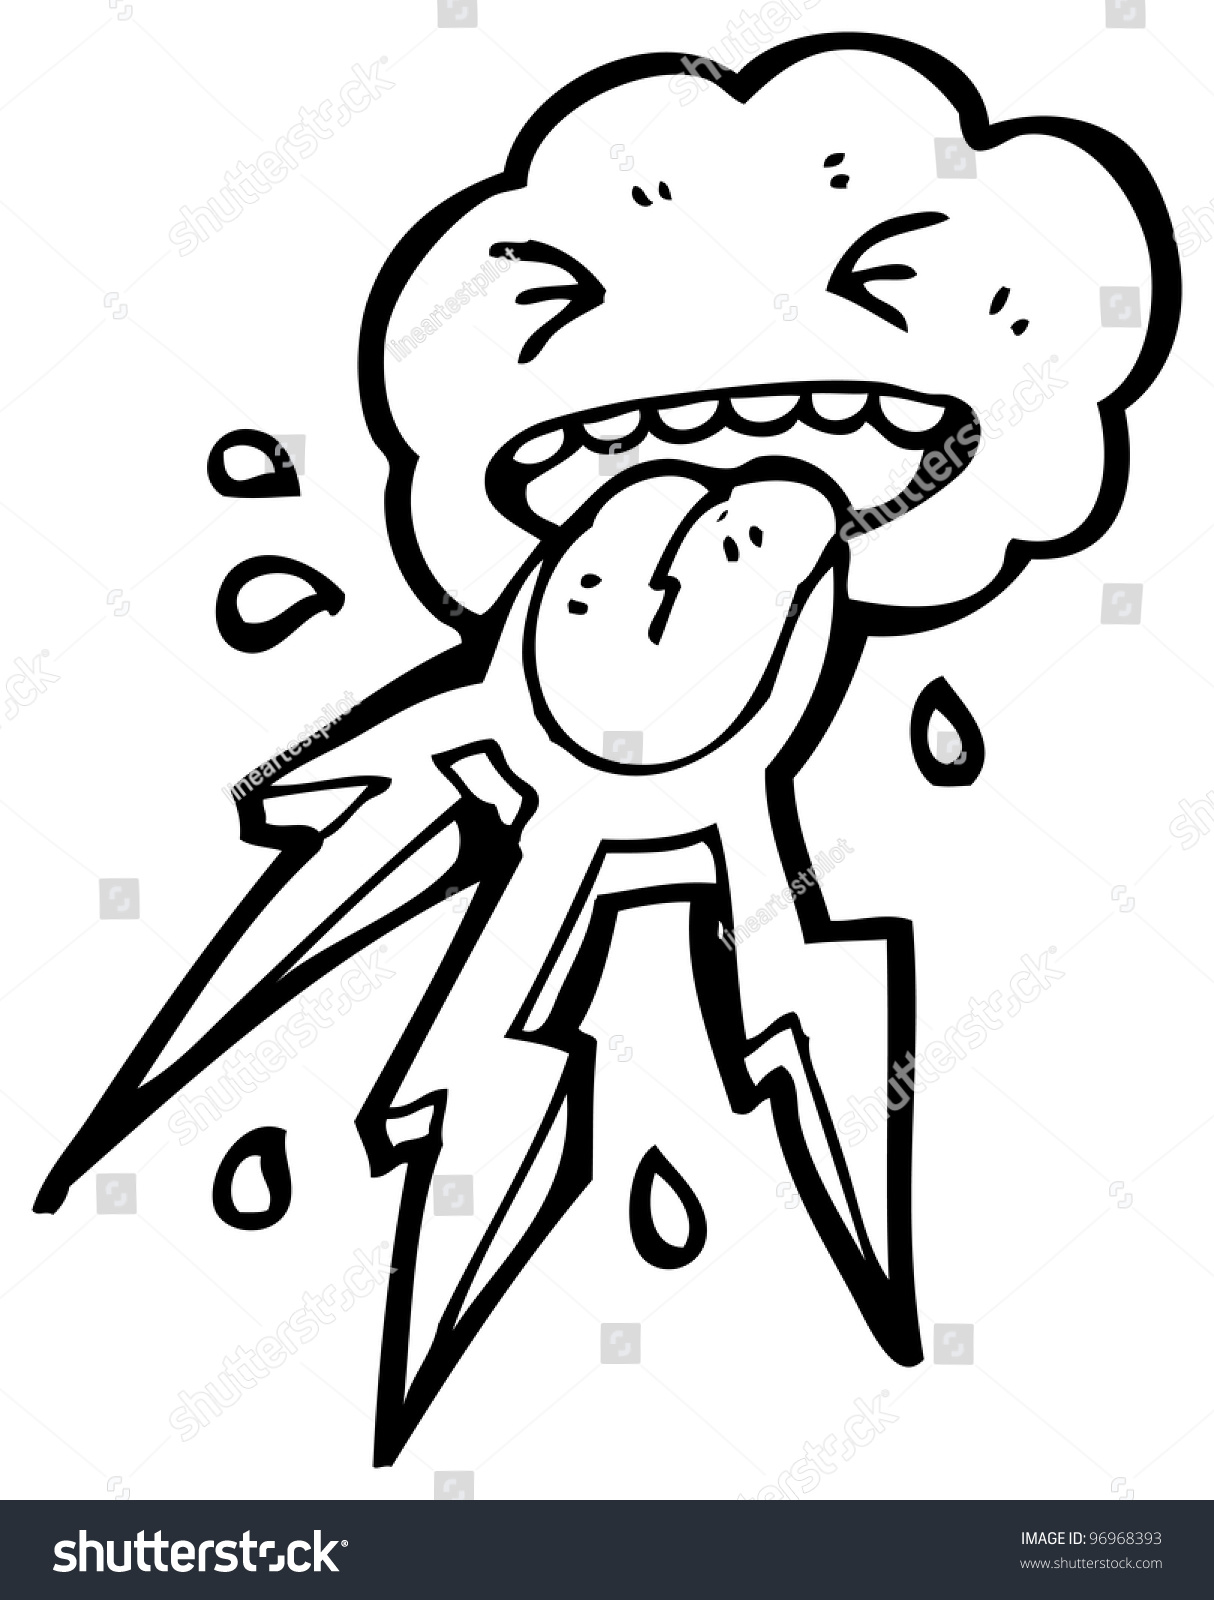 Cartoon Angry Storm Cloud Stock Illustration 96968393 ...